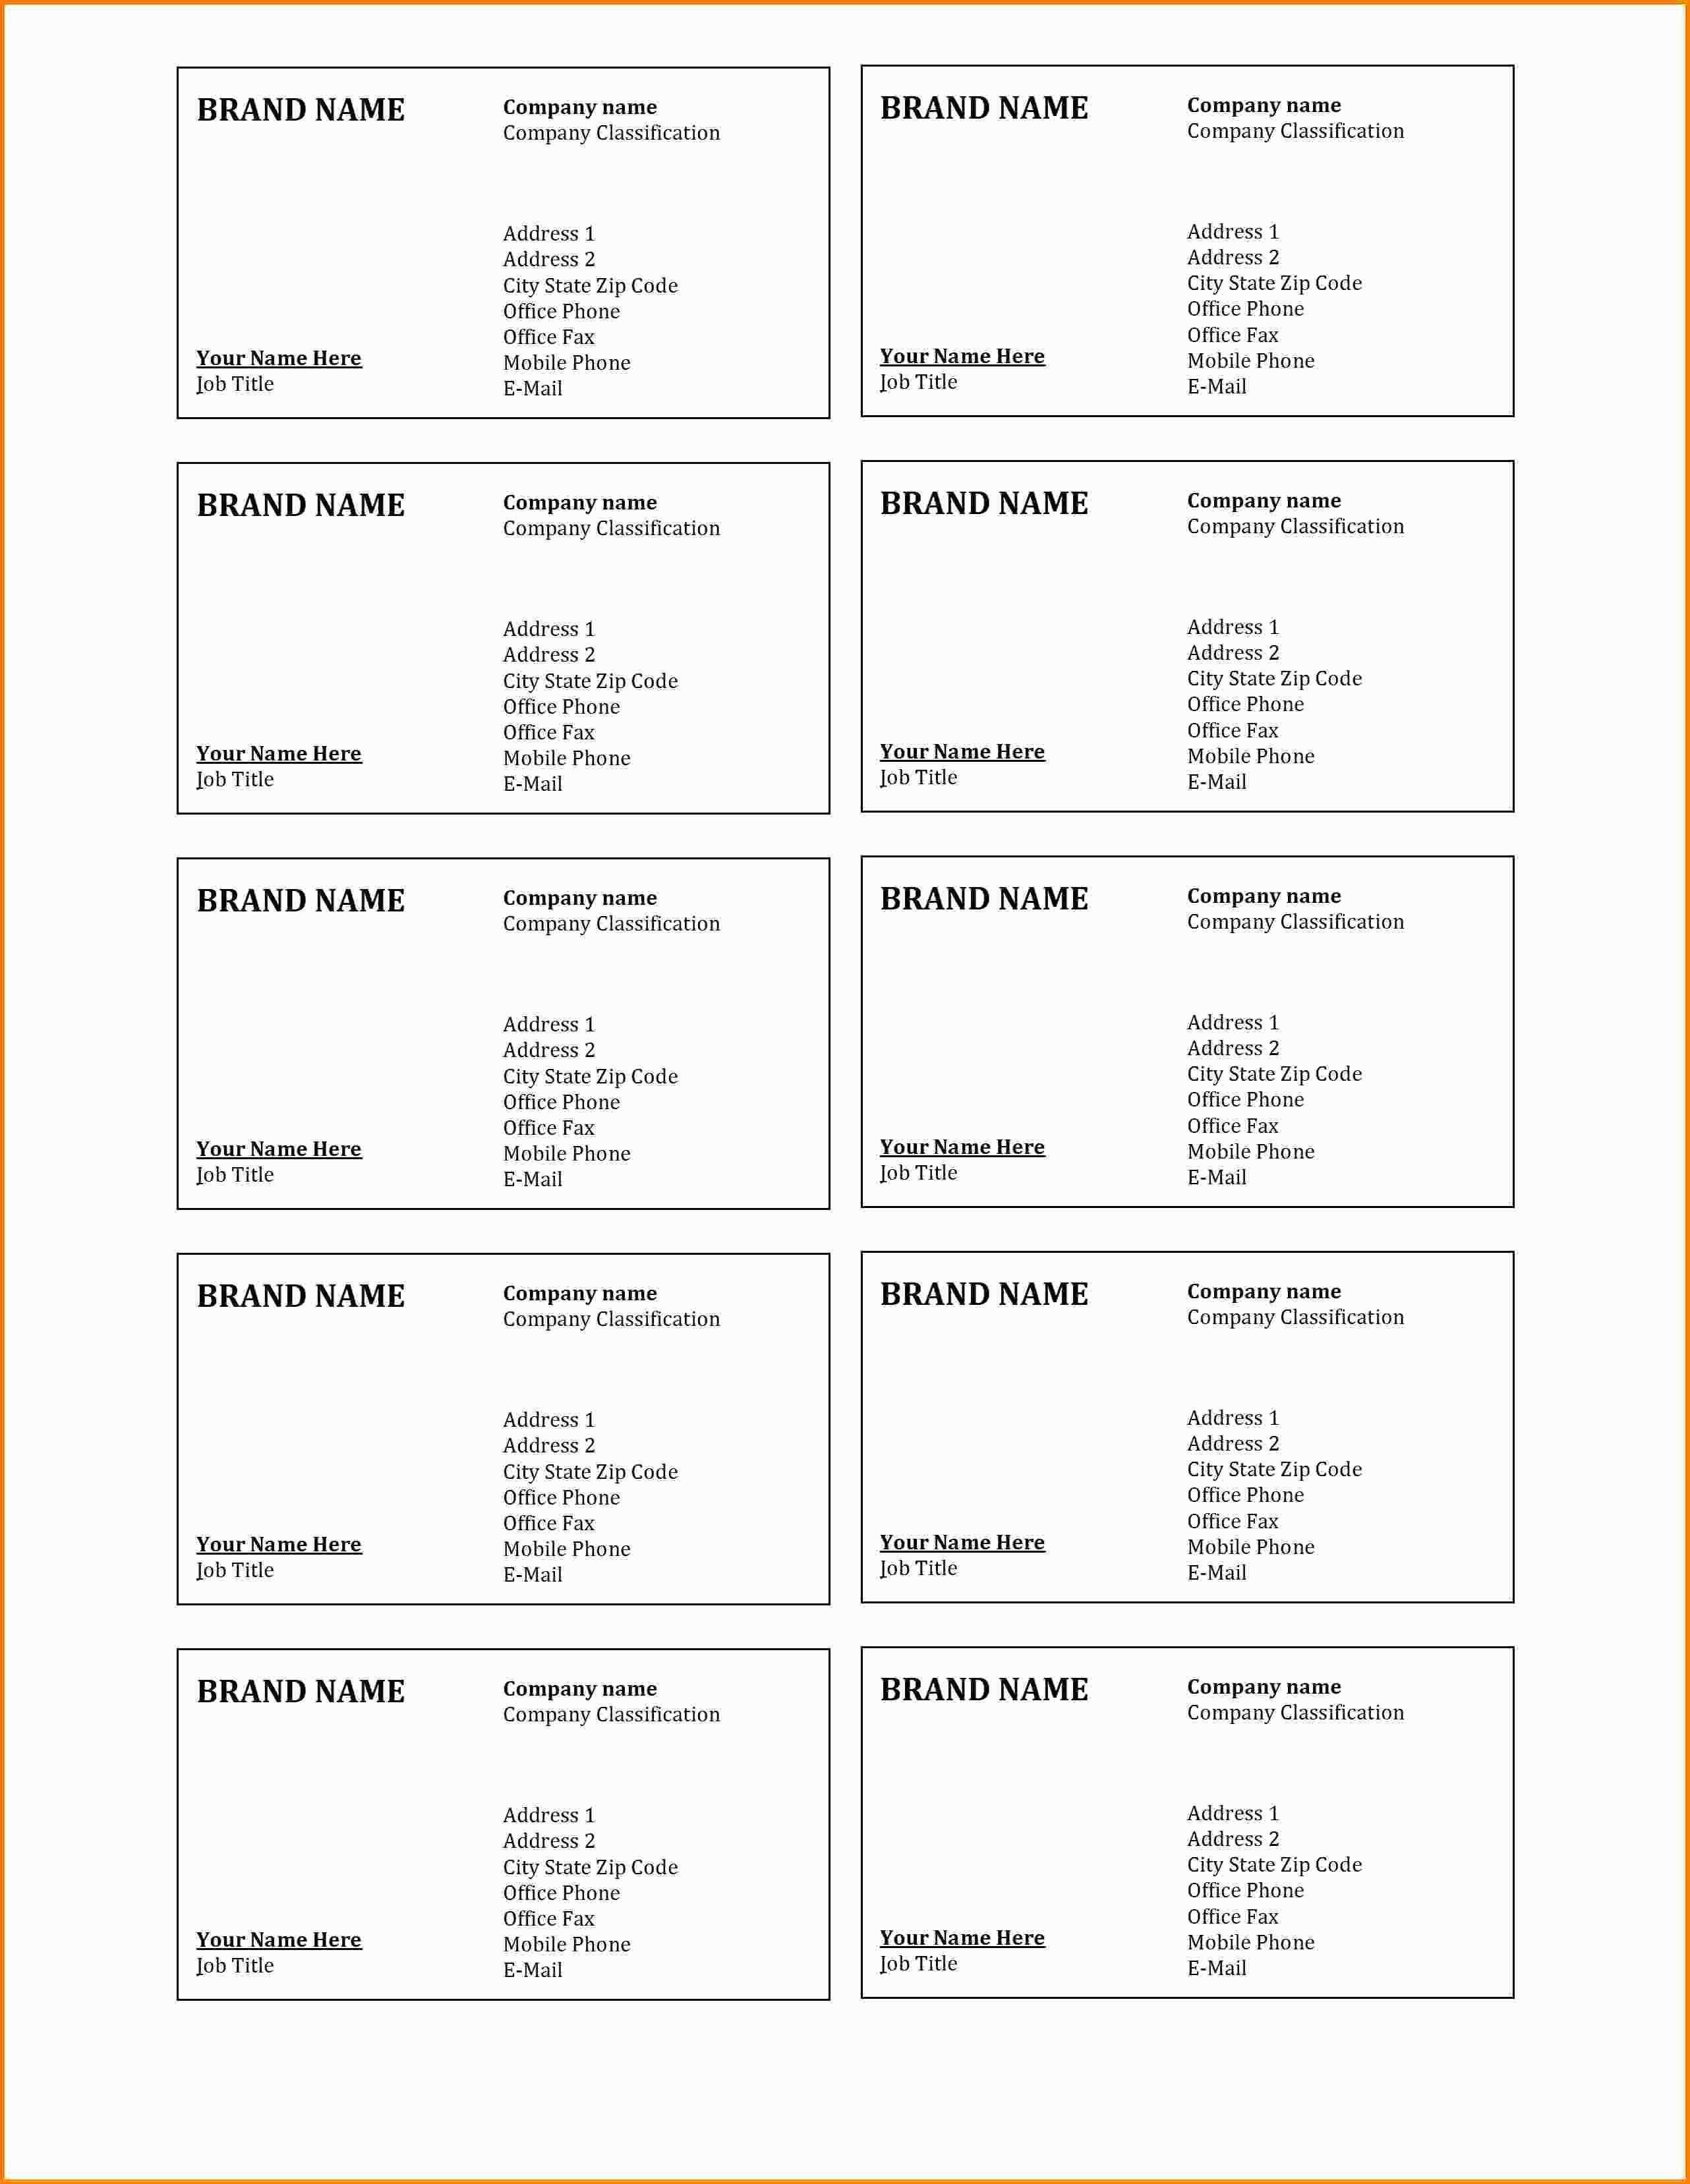 30 Format Business Card Template Free Download Uk PSD File by Business Card Template Free Download Uk